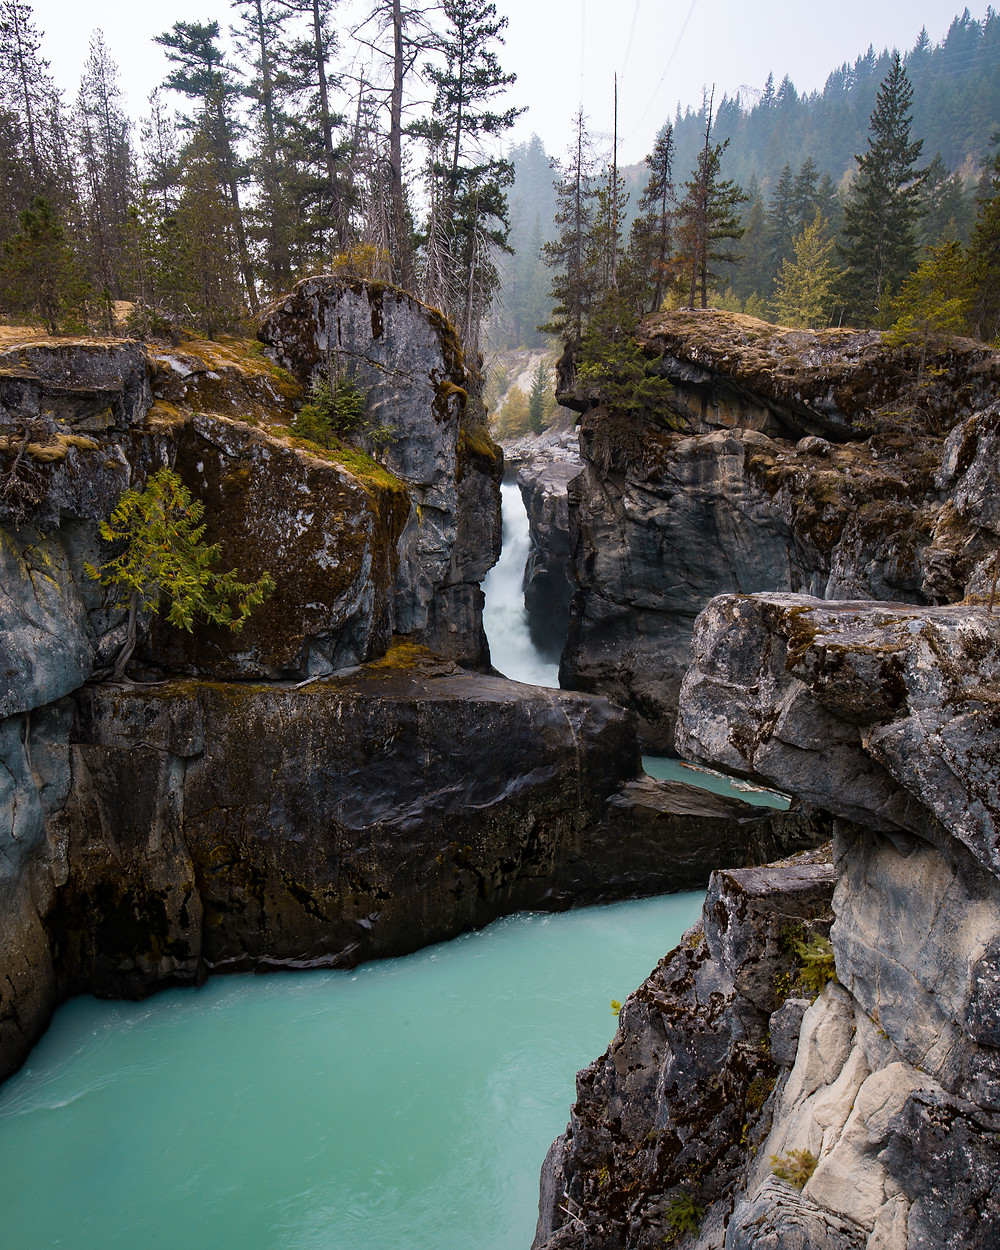 Nairn Falls, British Columbia